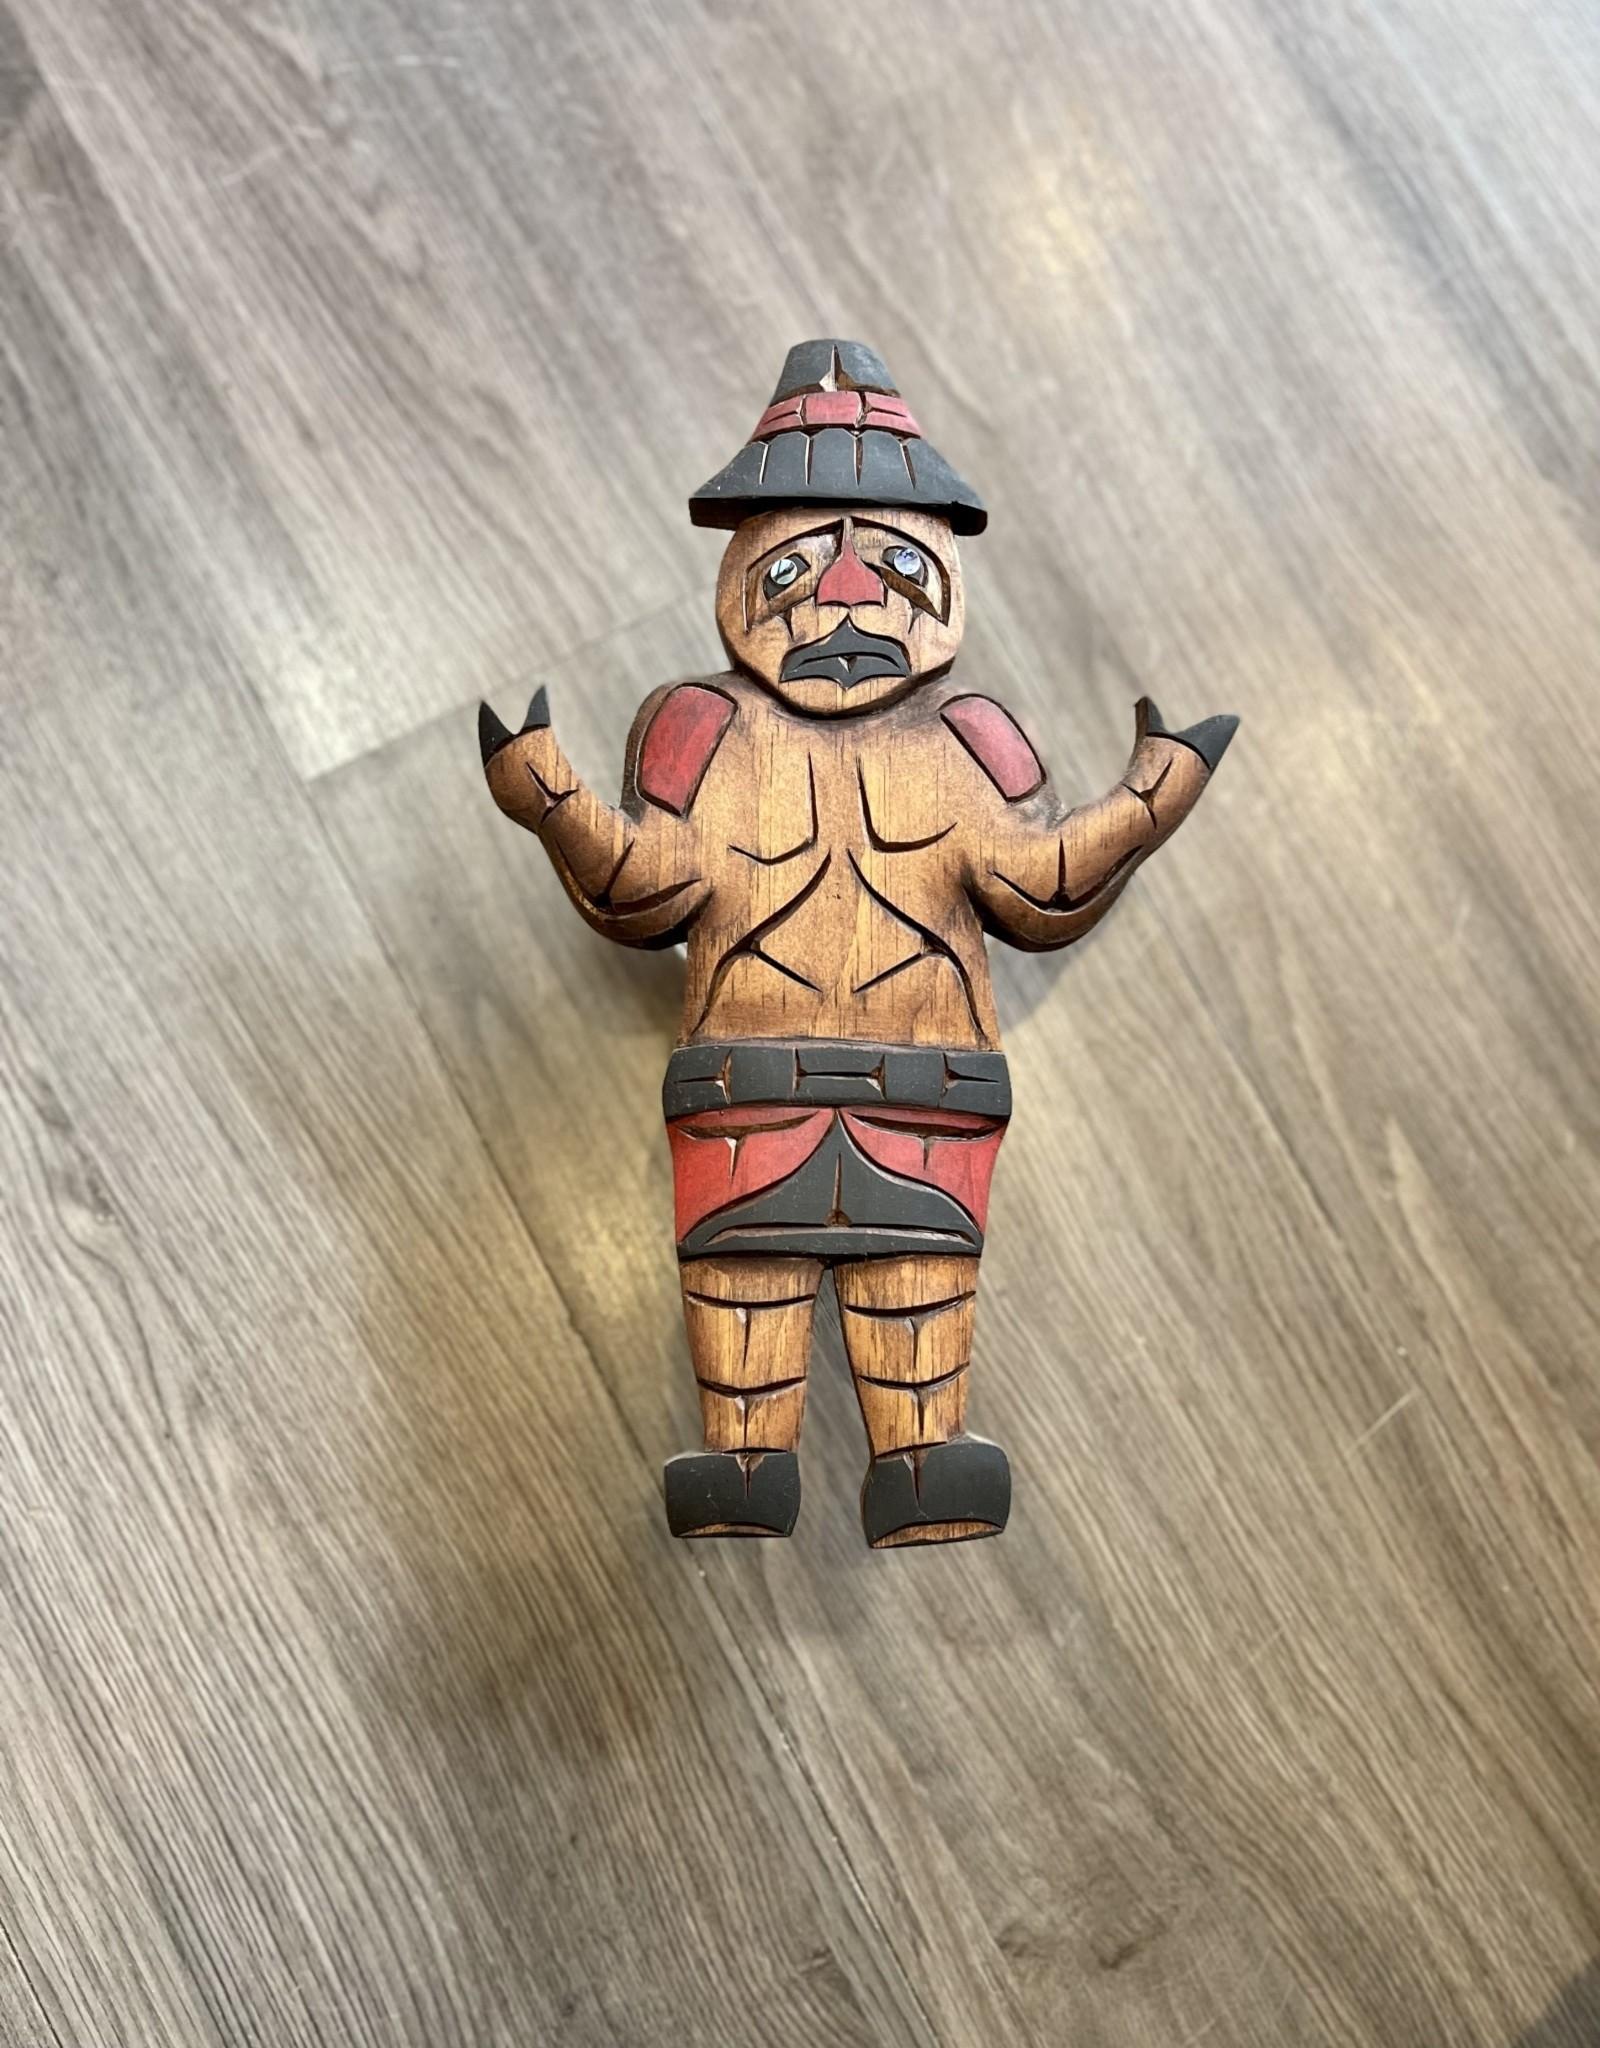 Aboriginal - Welcoming Man Carving